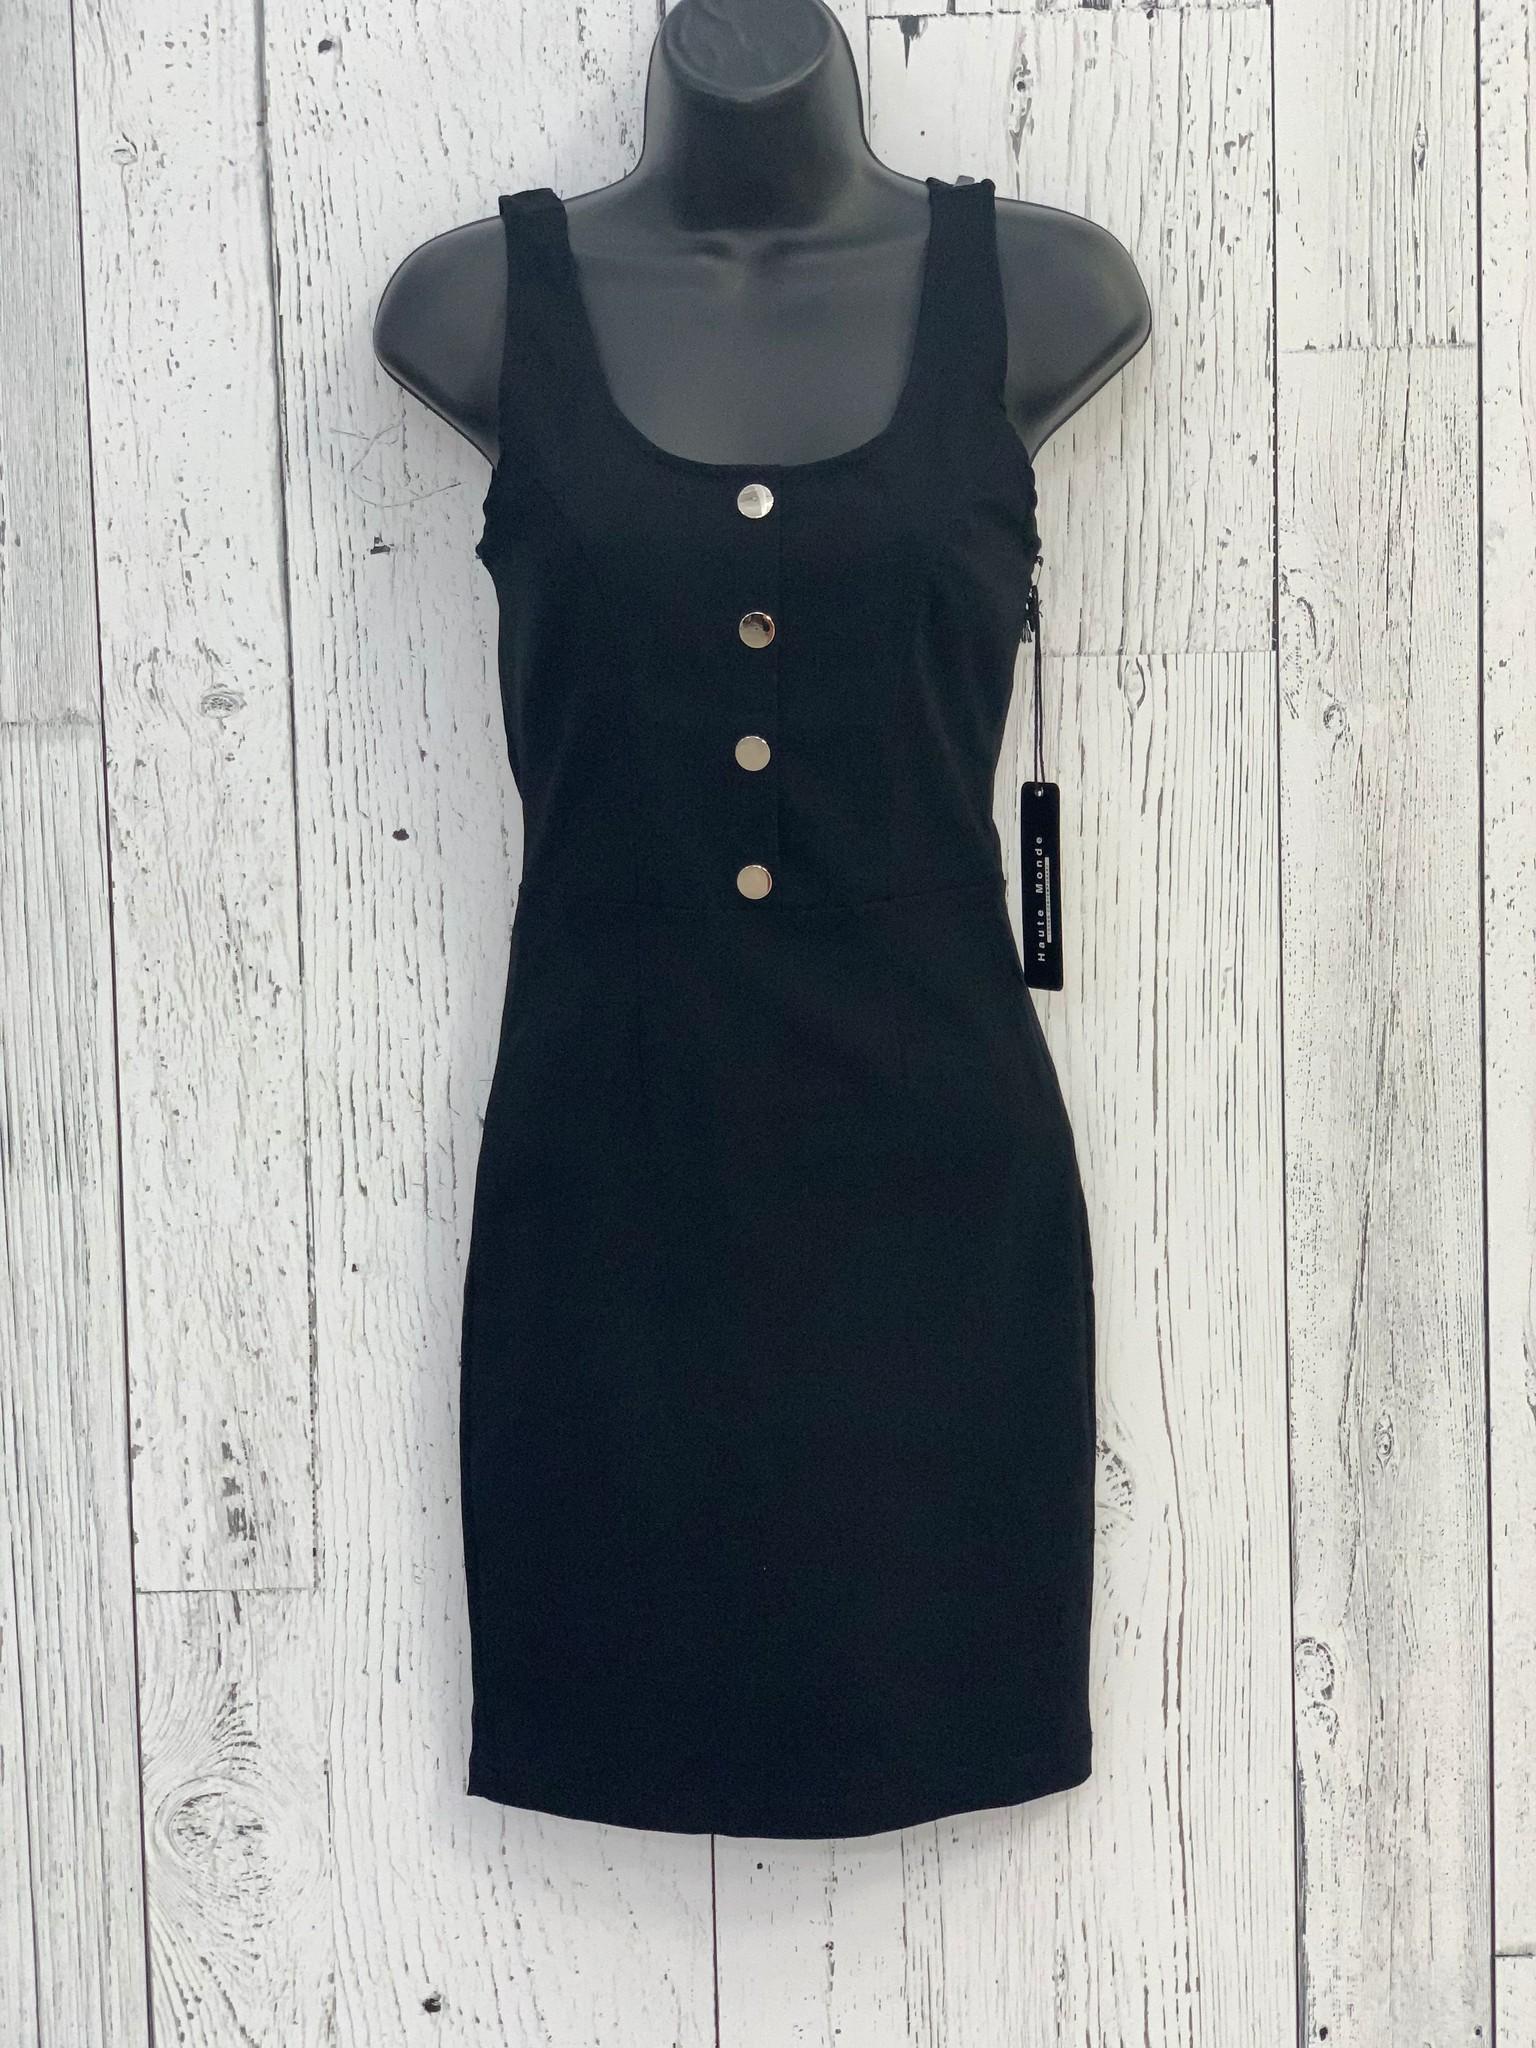 stretch button dress